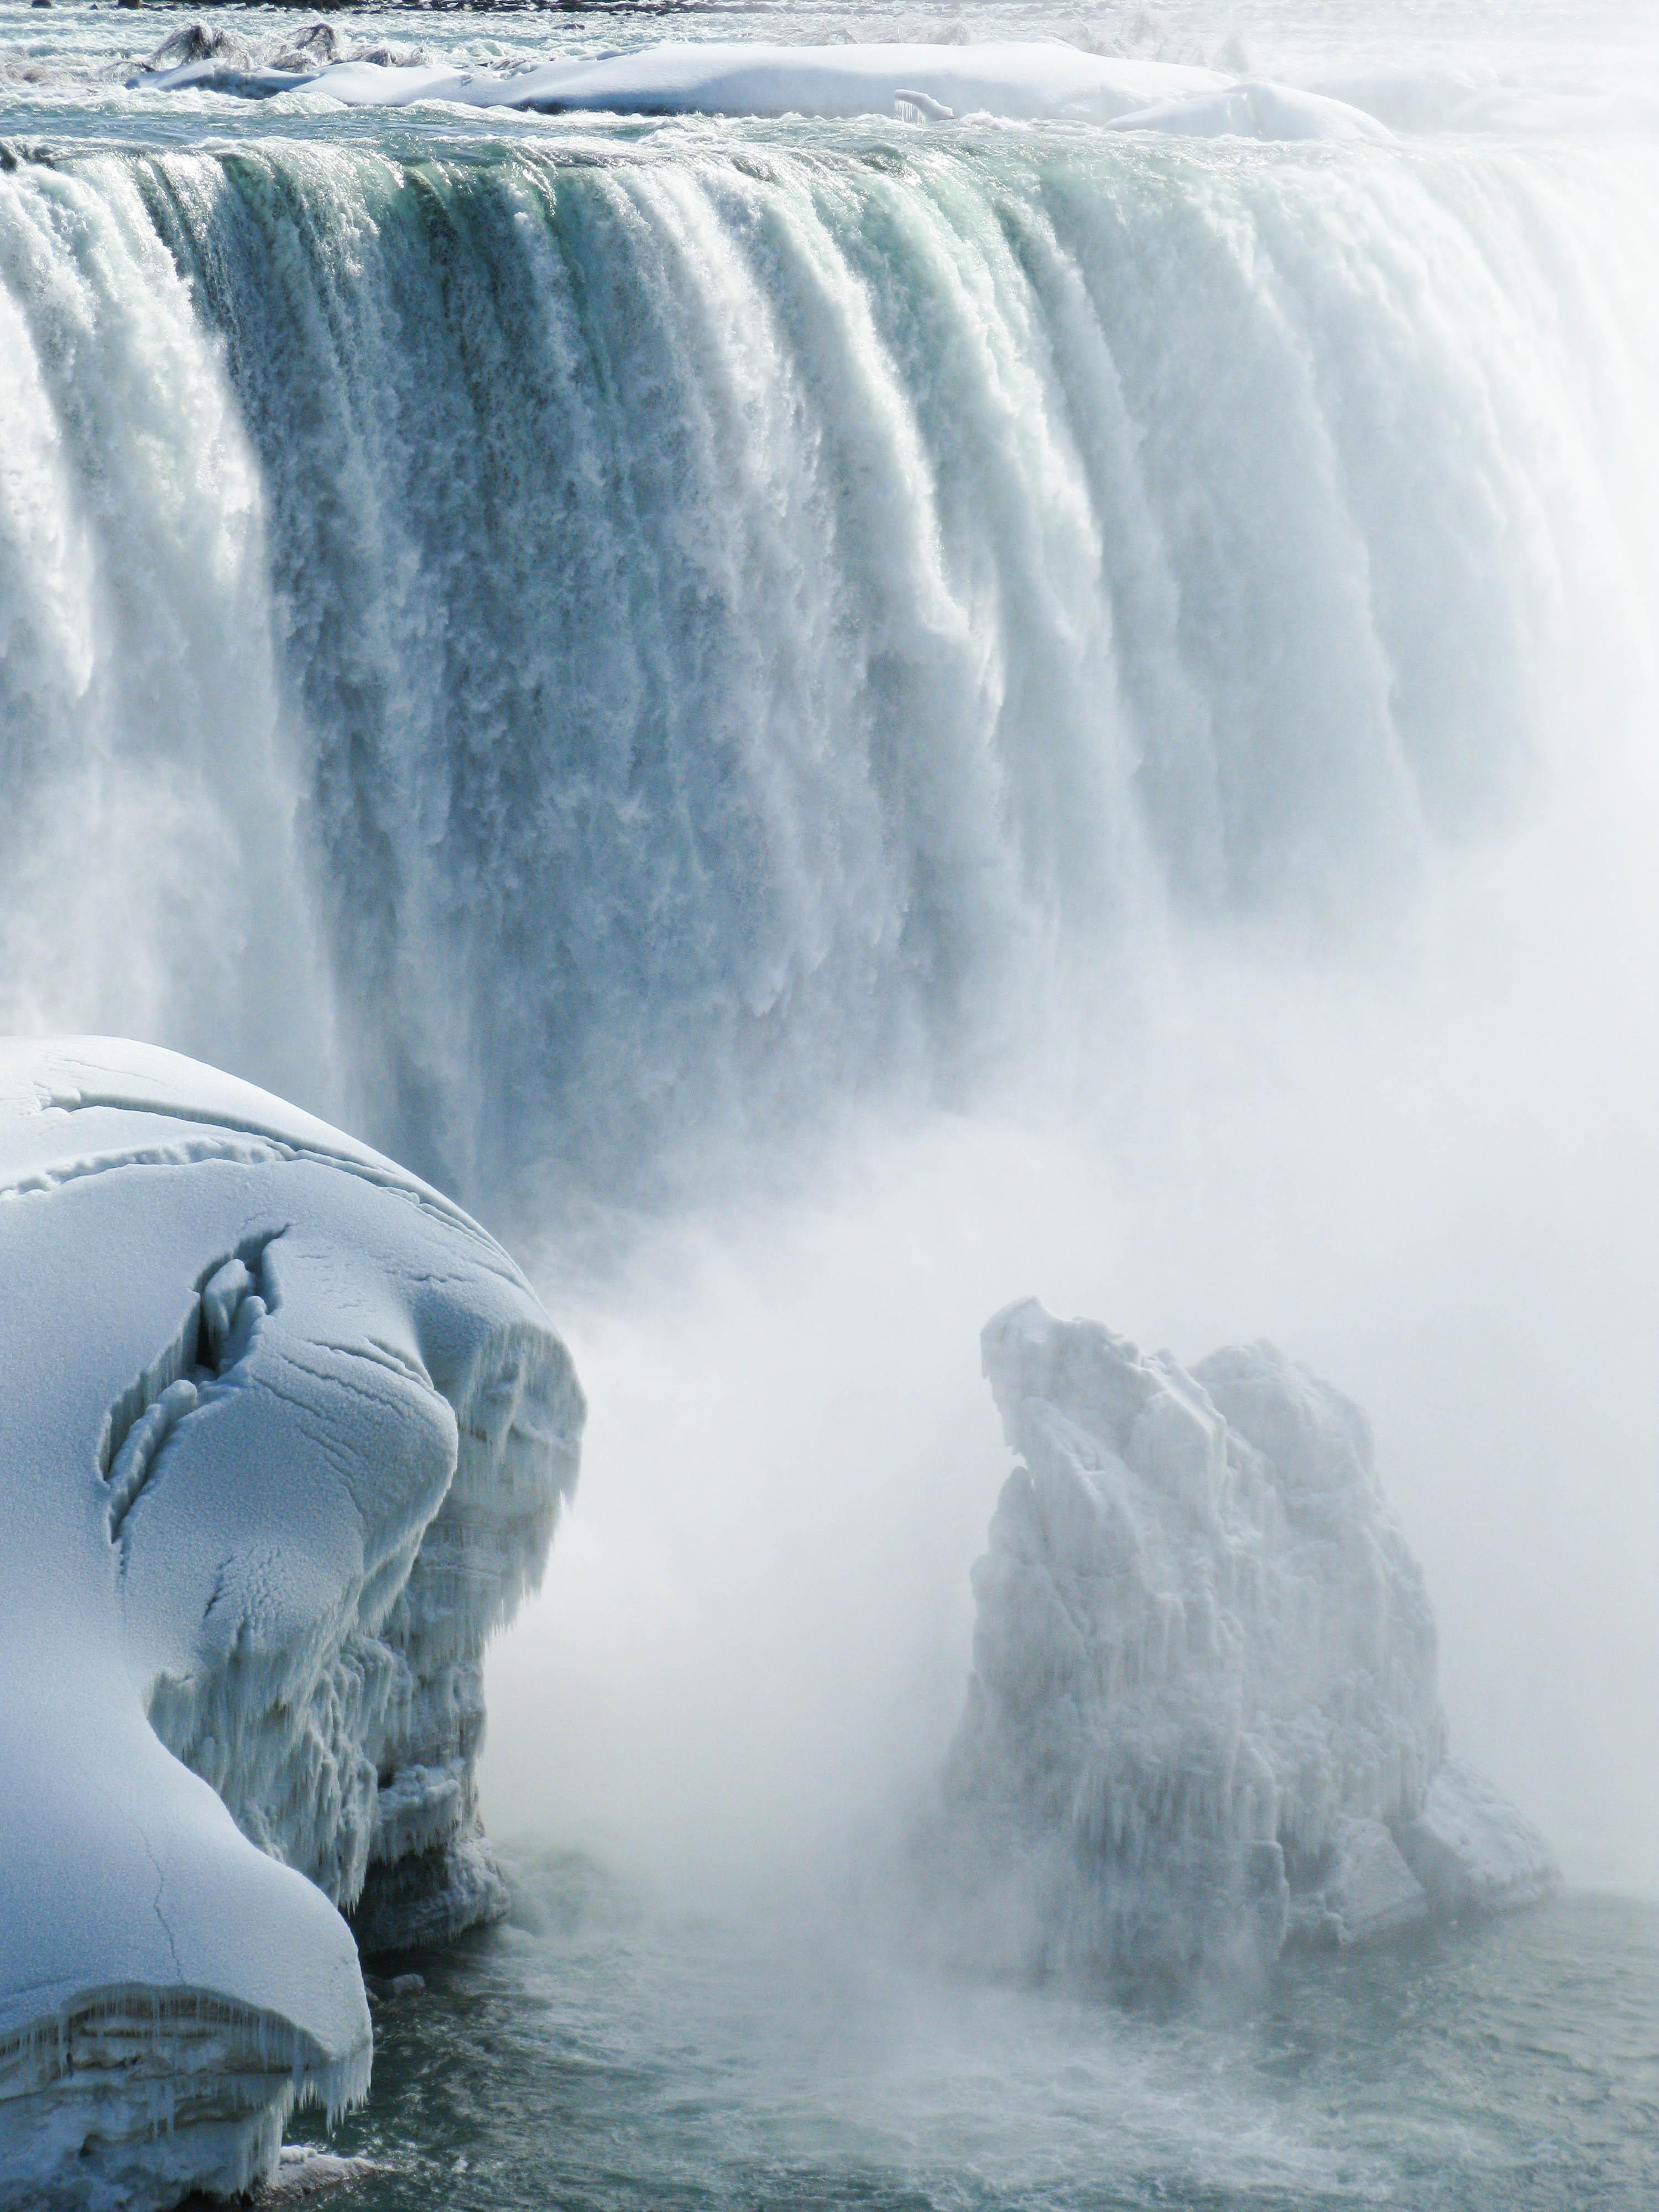 Snowy American Falls, Niagara Falls